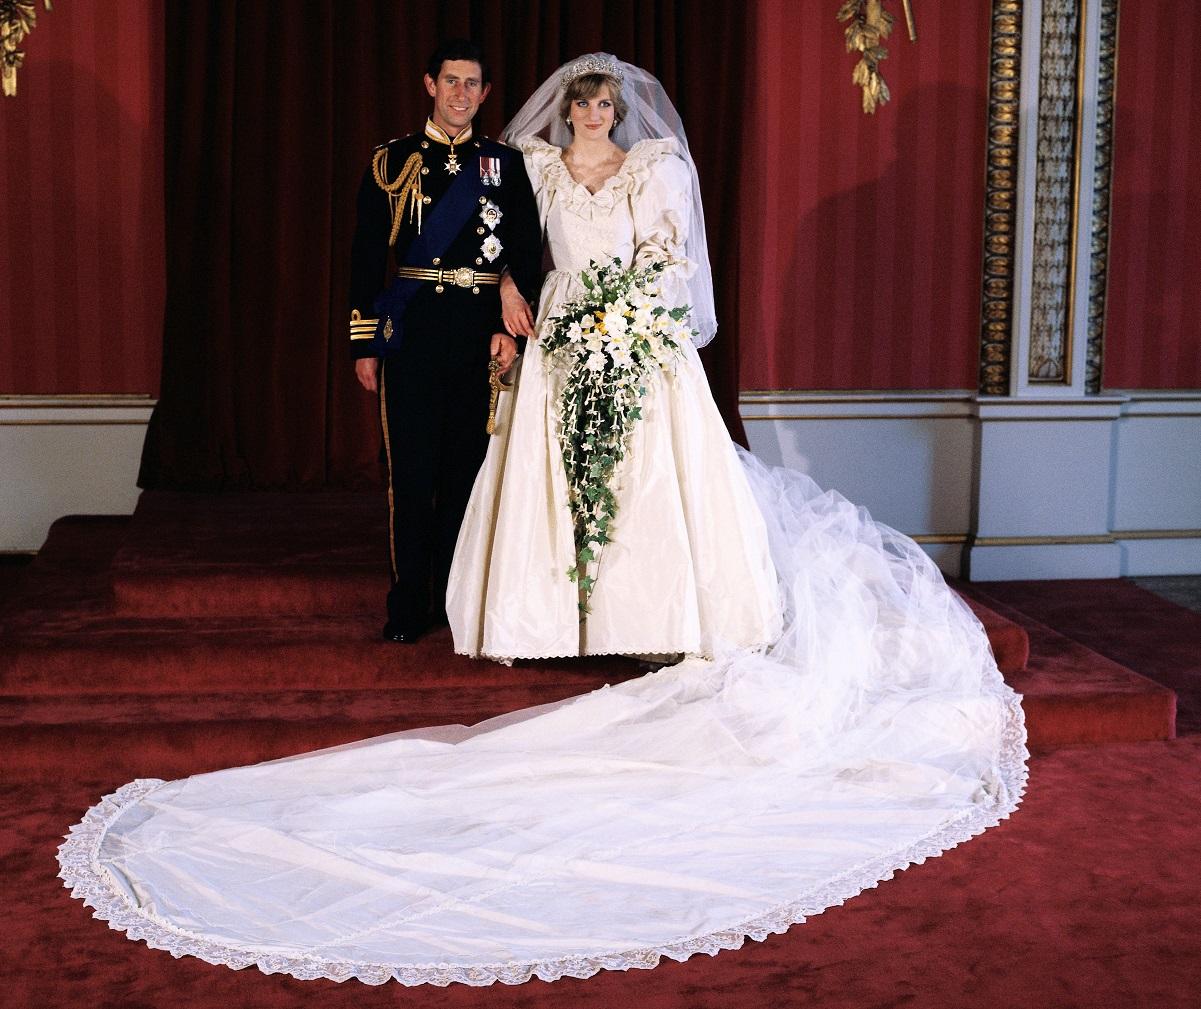 svatba princezna Diana a princ Charles